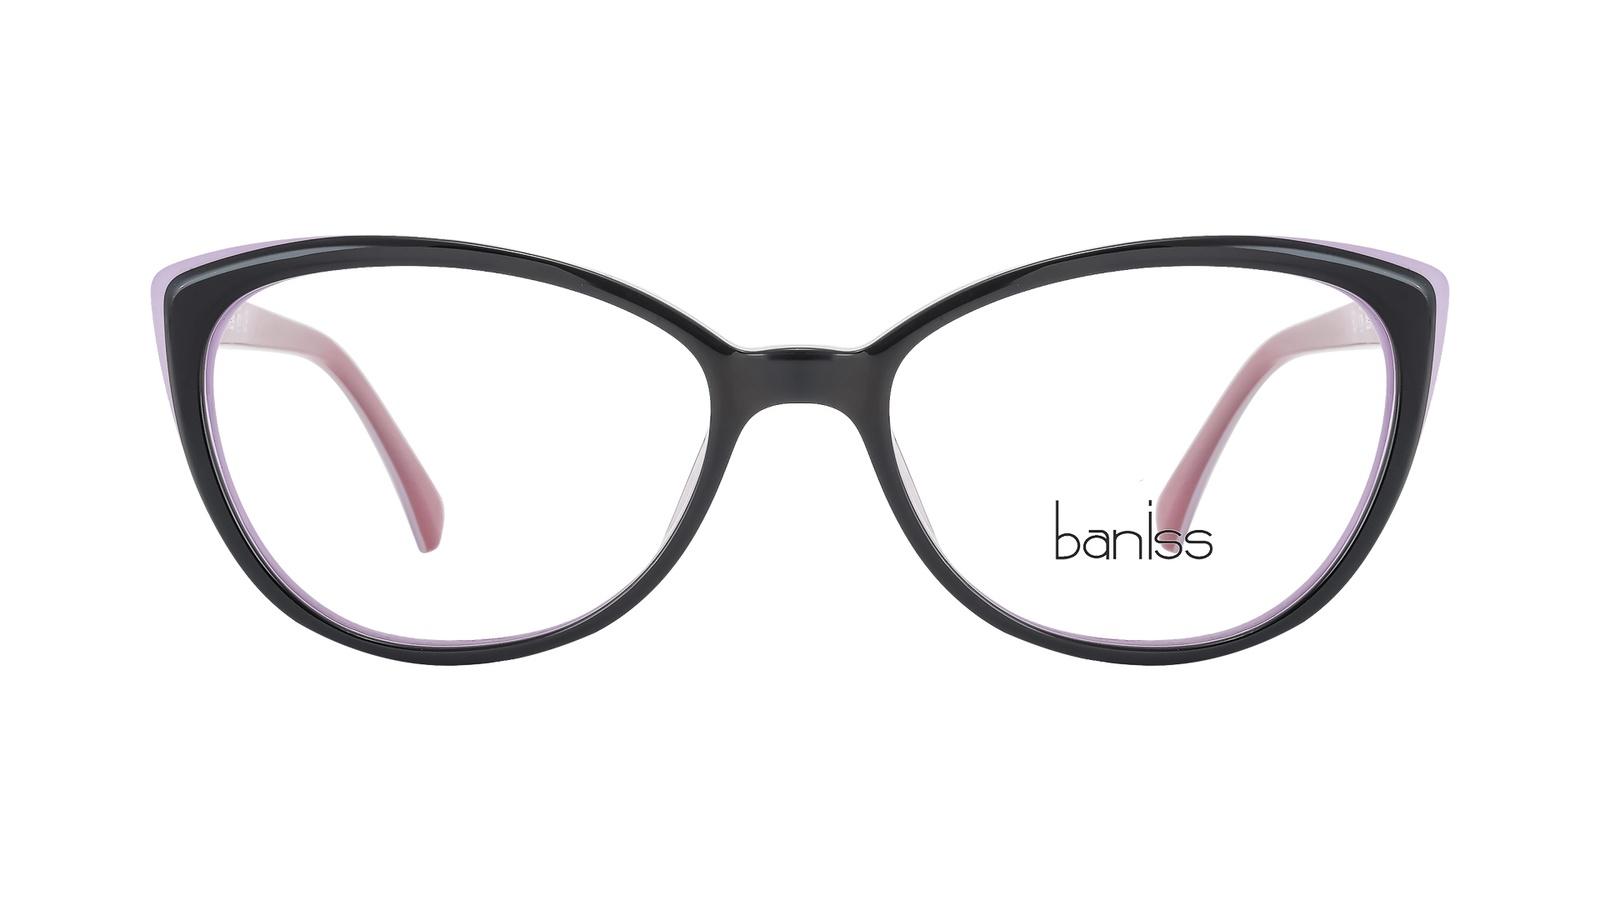 Оправа для очков, BANISS, пластик, BS7010 C02